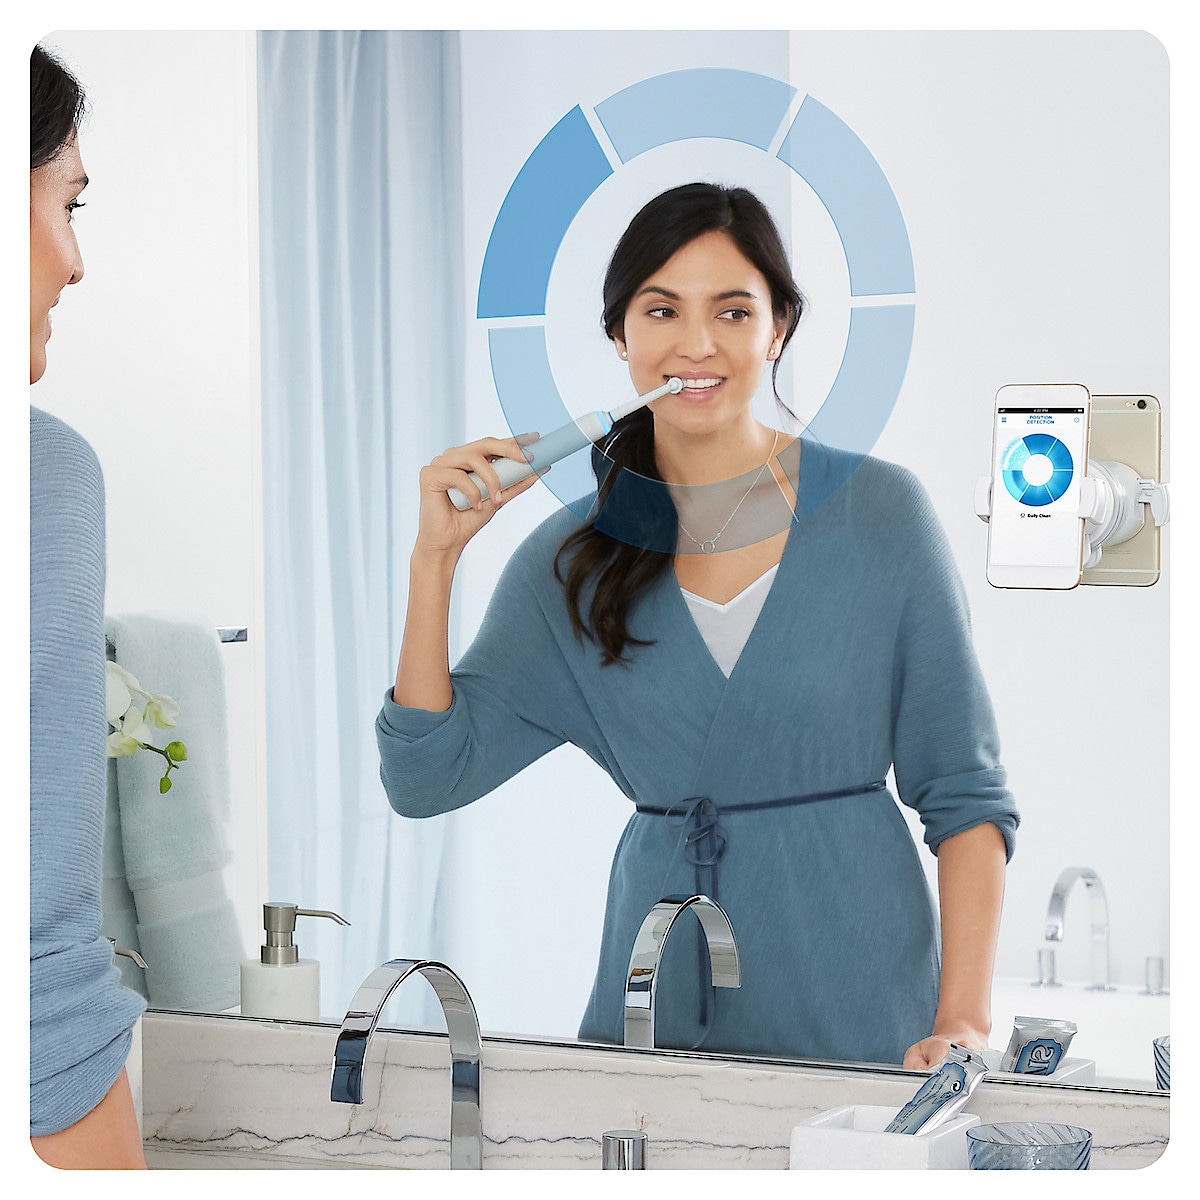 Oral-B Genius 8200W Silver Electric Toothbrush